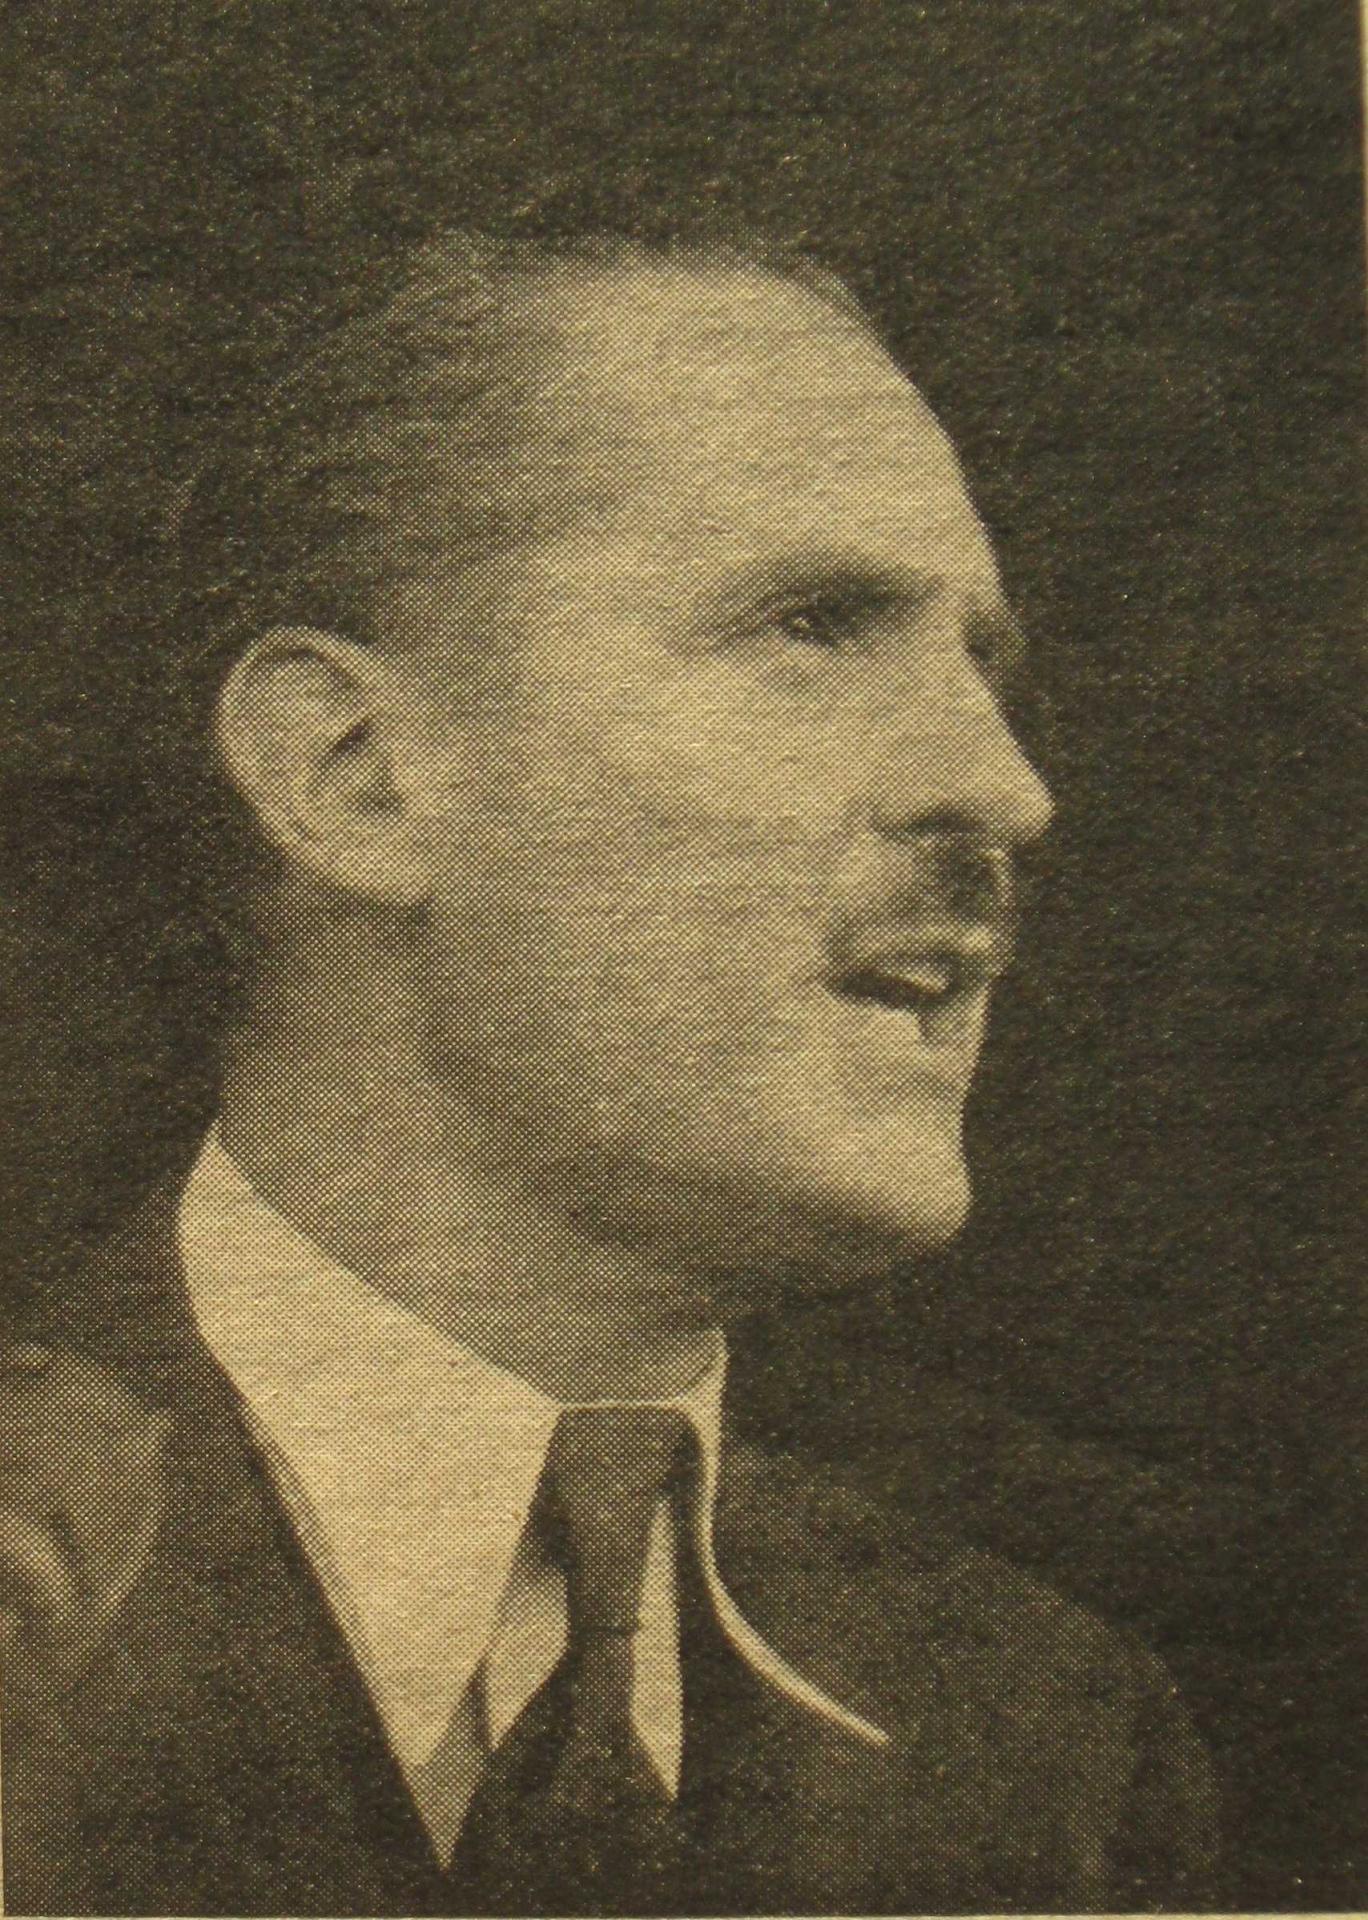 Georges LAMIRAND